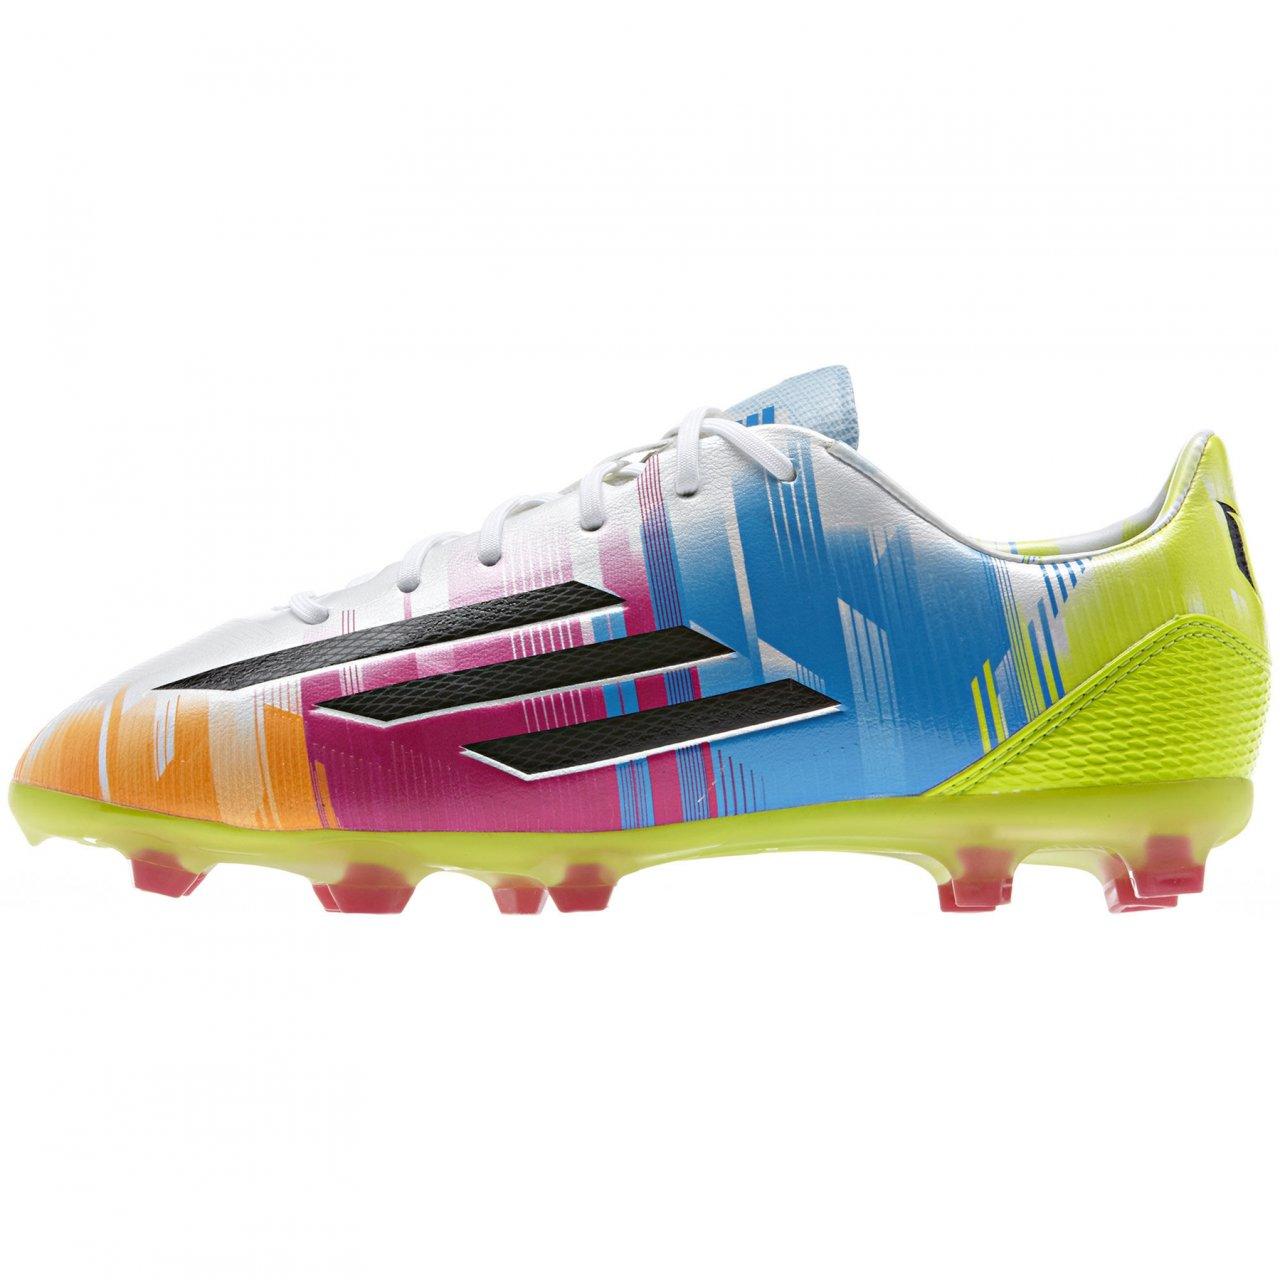 Adidas Kinder-Fußballschuh F50 ADIZERO TRX FG J ME